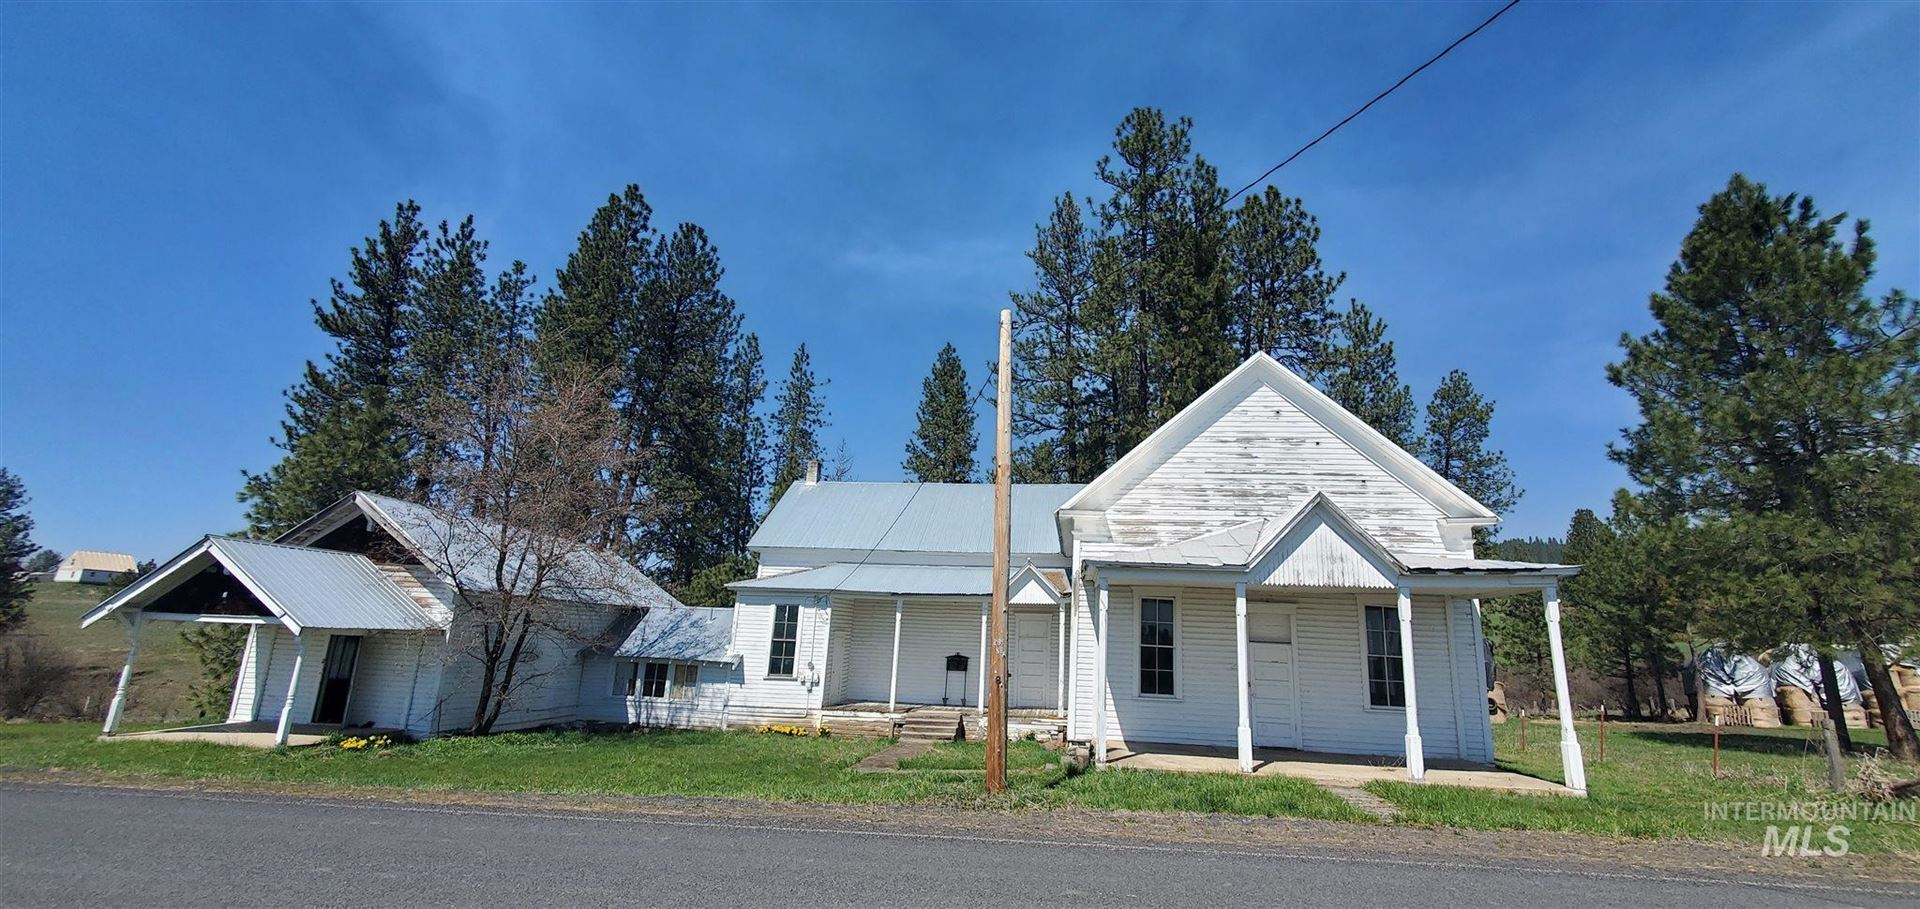 Photo of 2070 Woodland Rd, Kamiah, ID 83536 (MLS # 98800281)